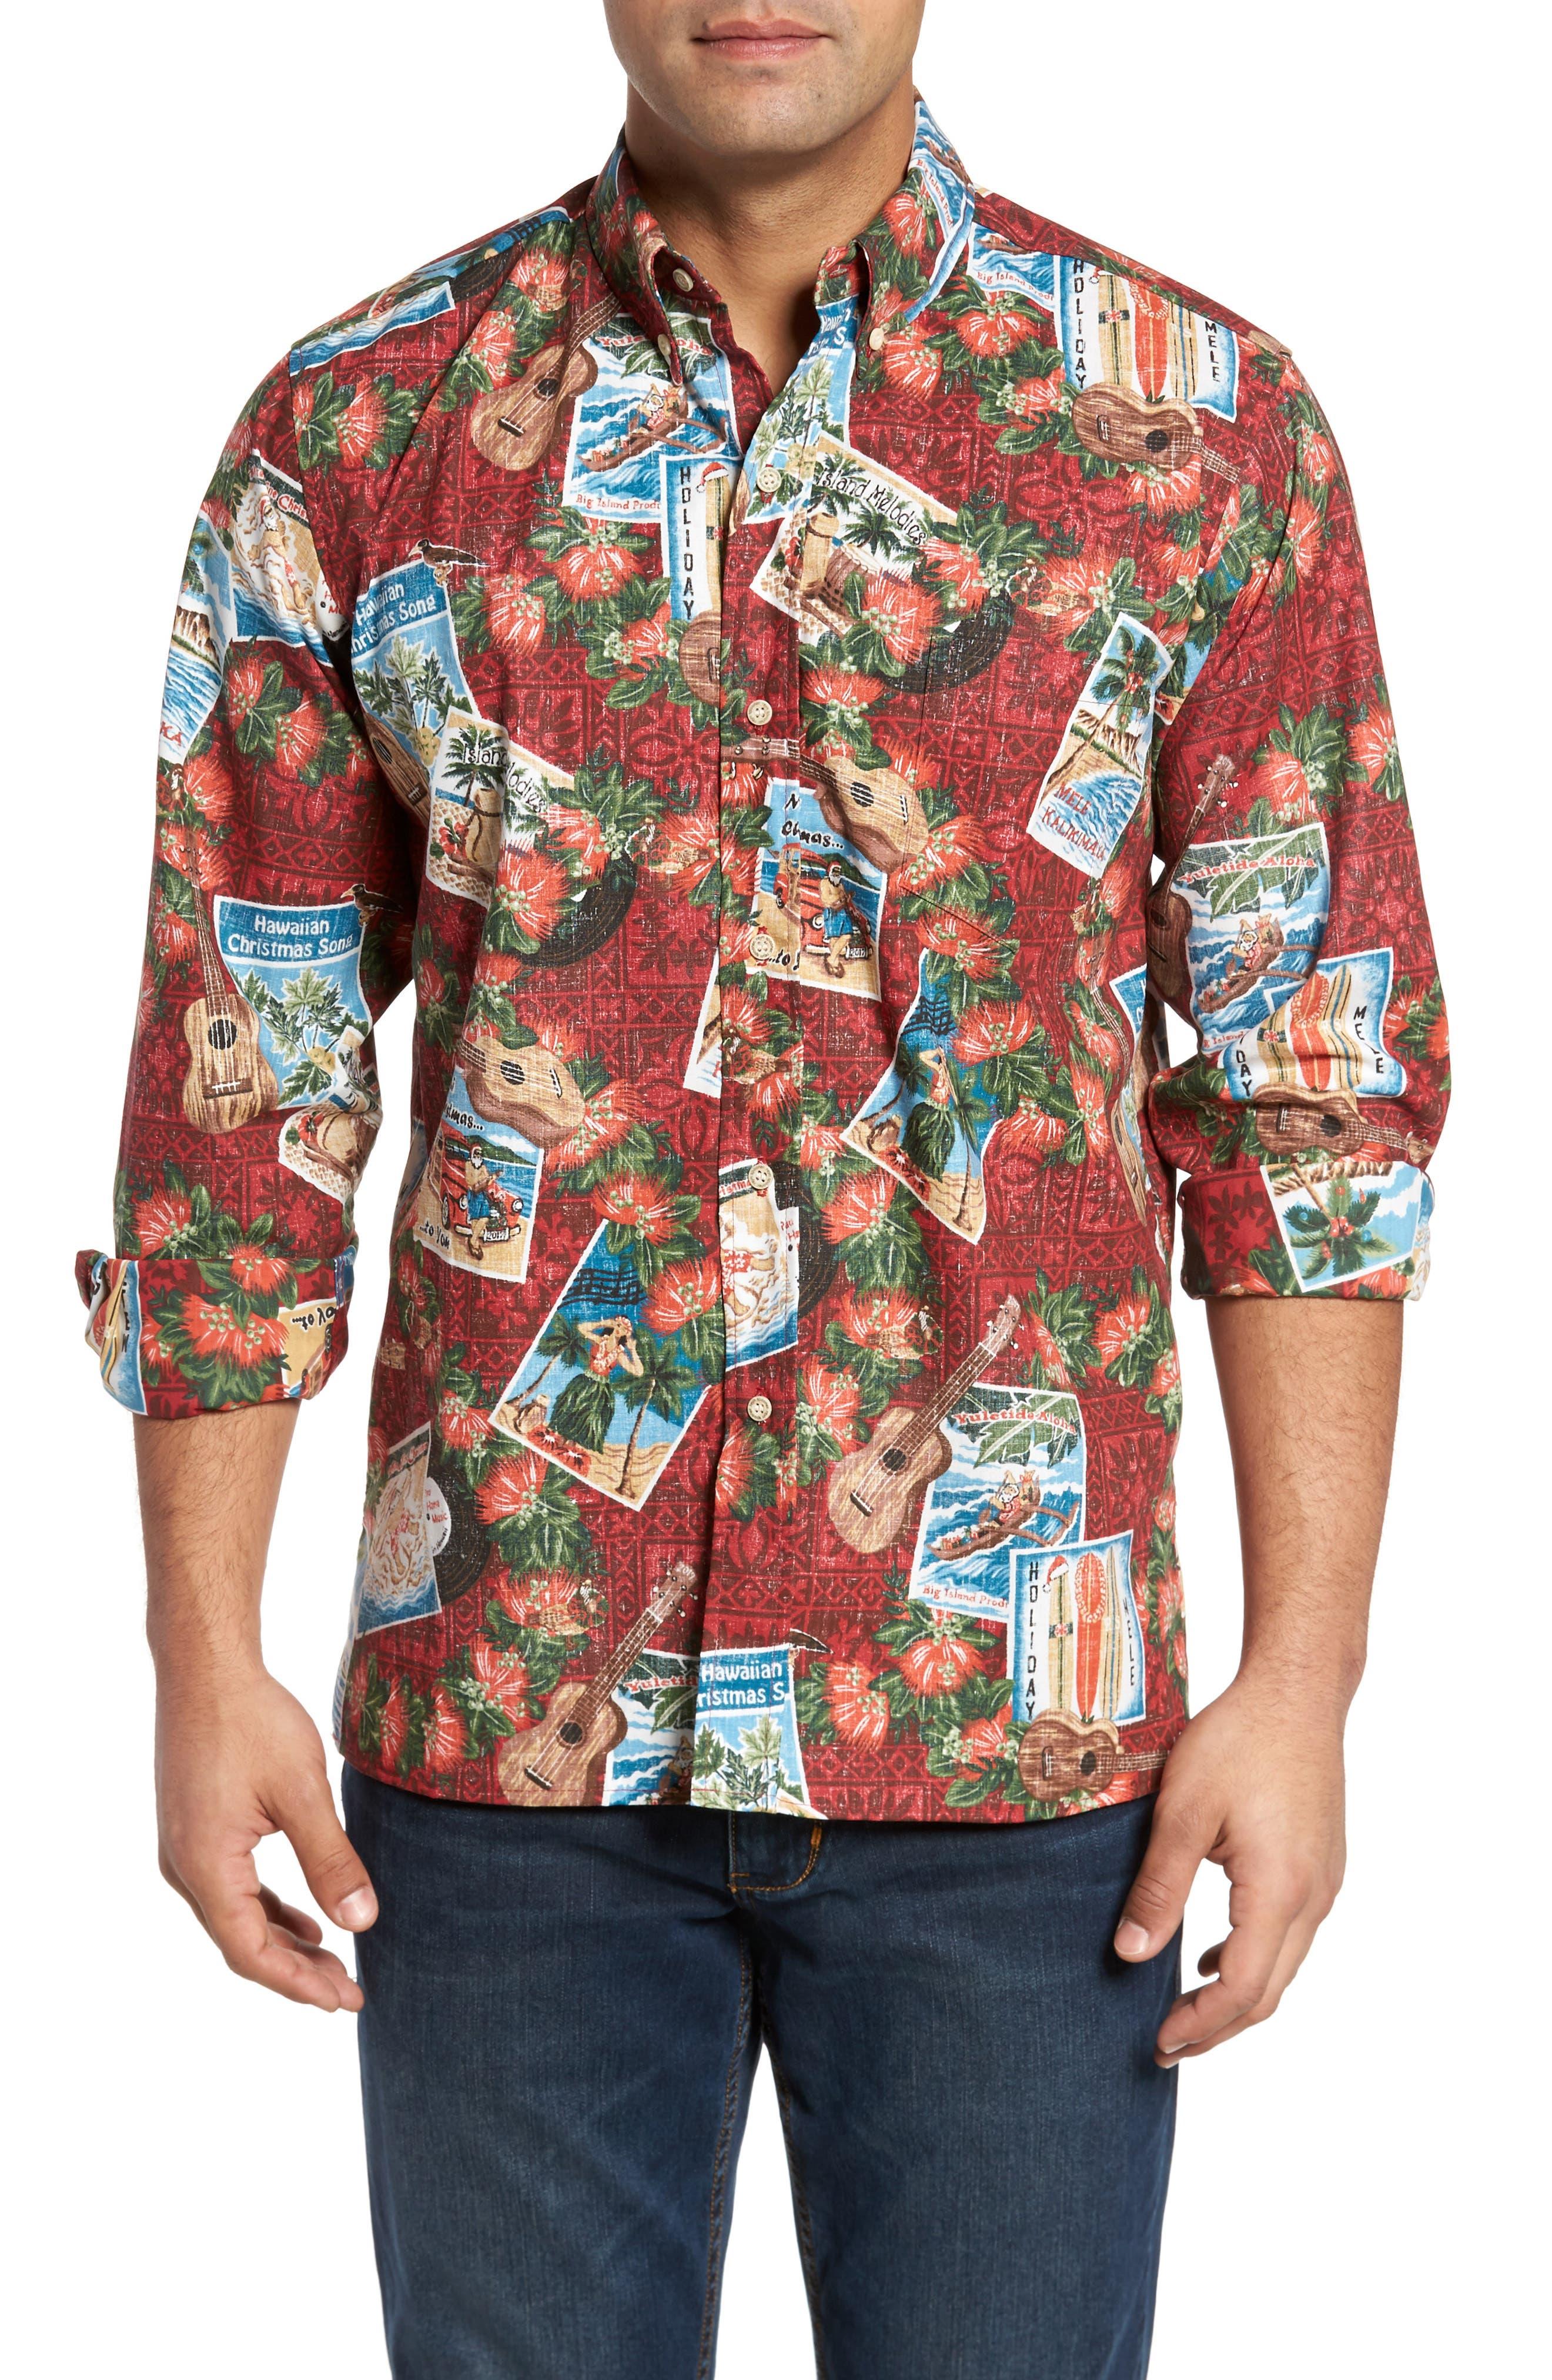 Alternate Image 1 Selected - Reyn Spooner Hawaiian Christmas 2017 Sport Shirt